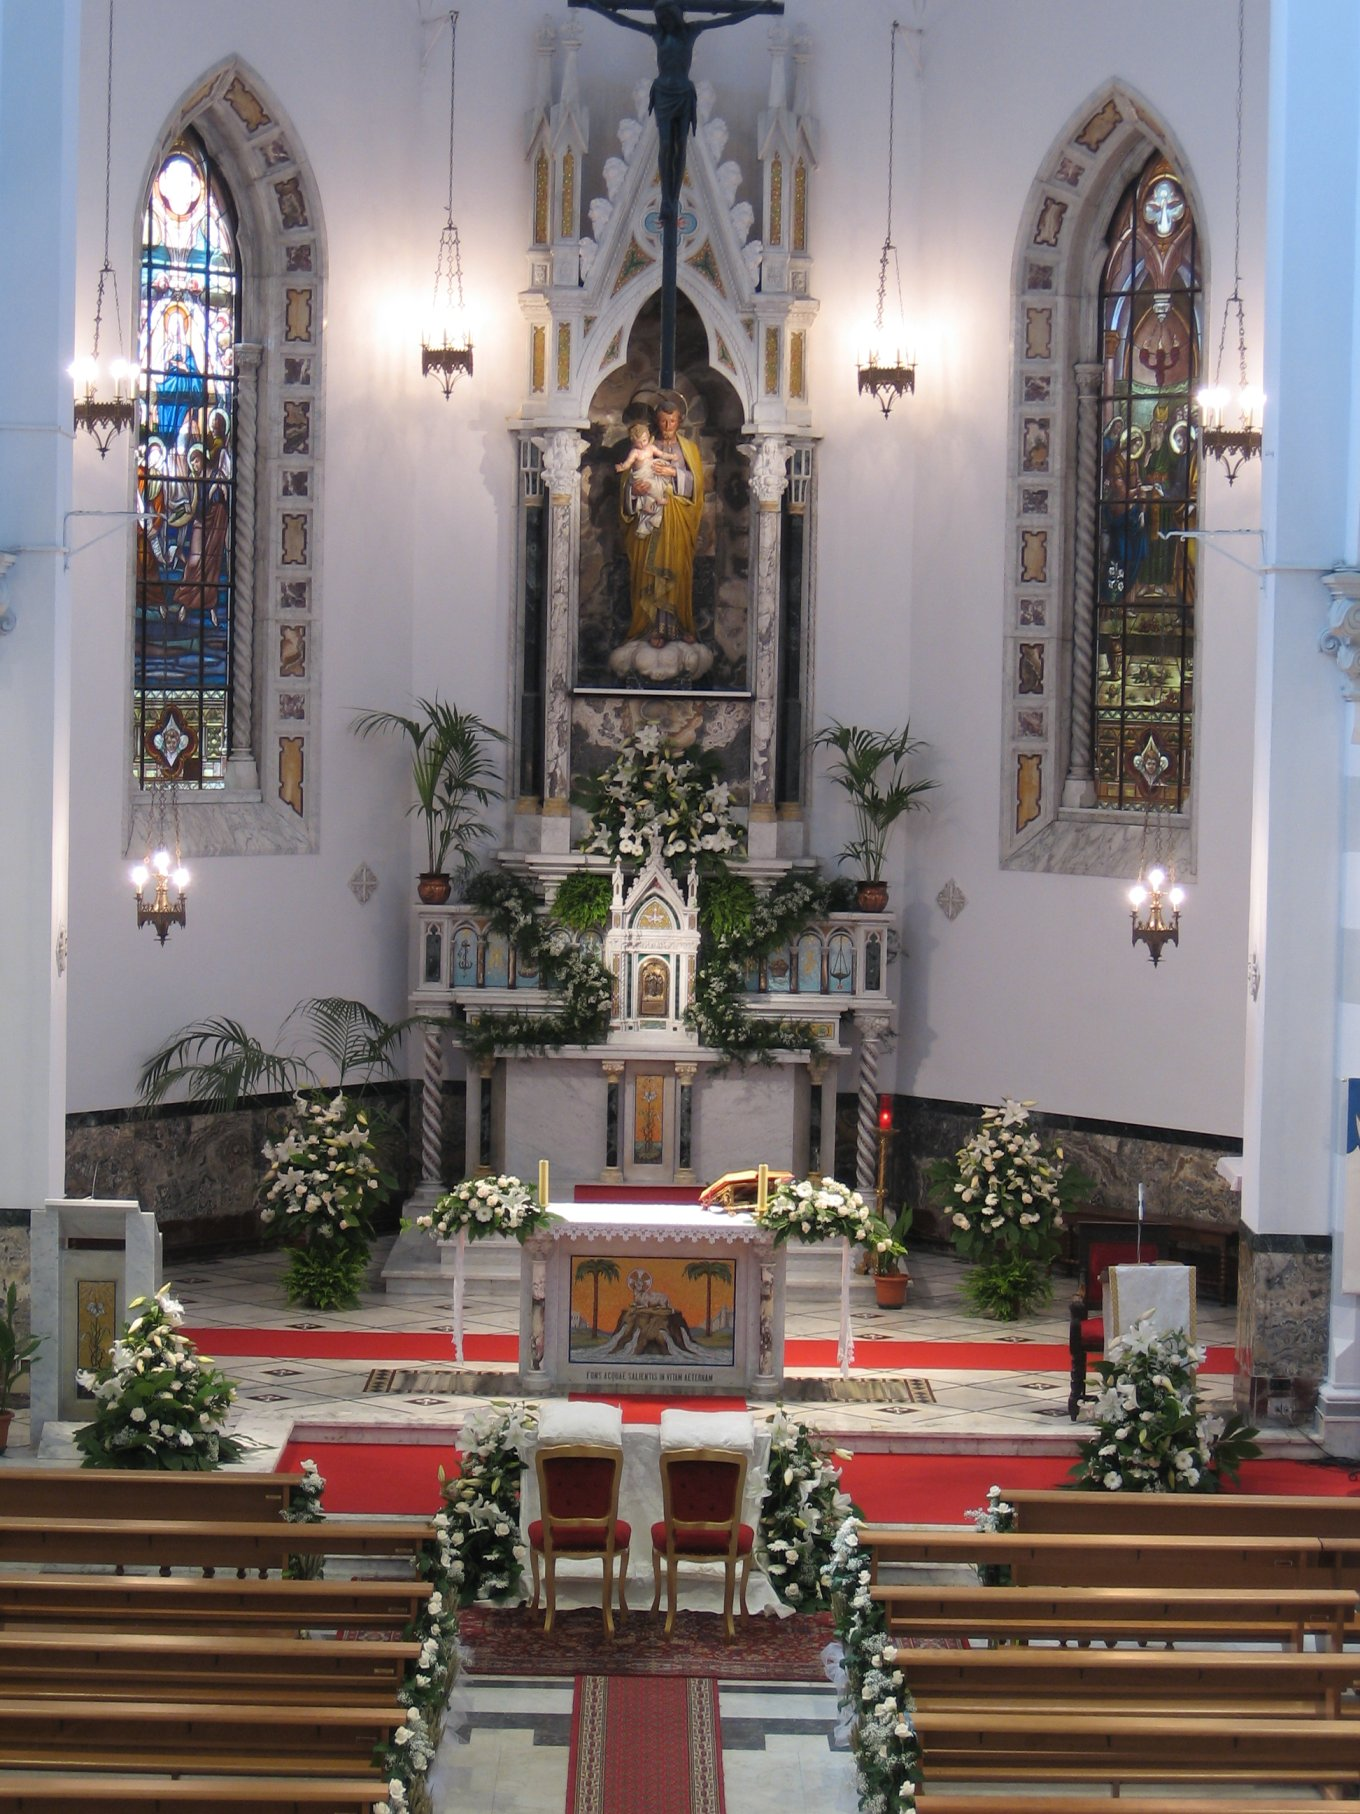 Chiesa_interno-2008-07-26-15.08.03.jpg